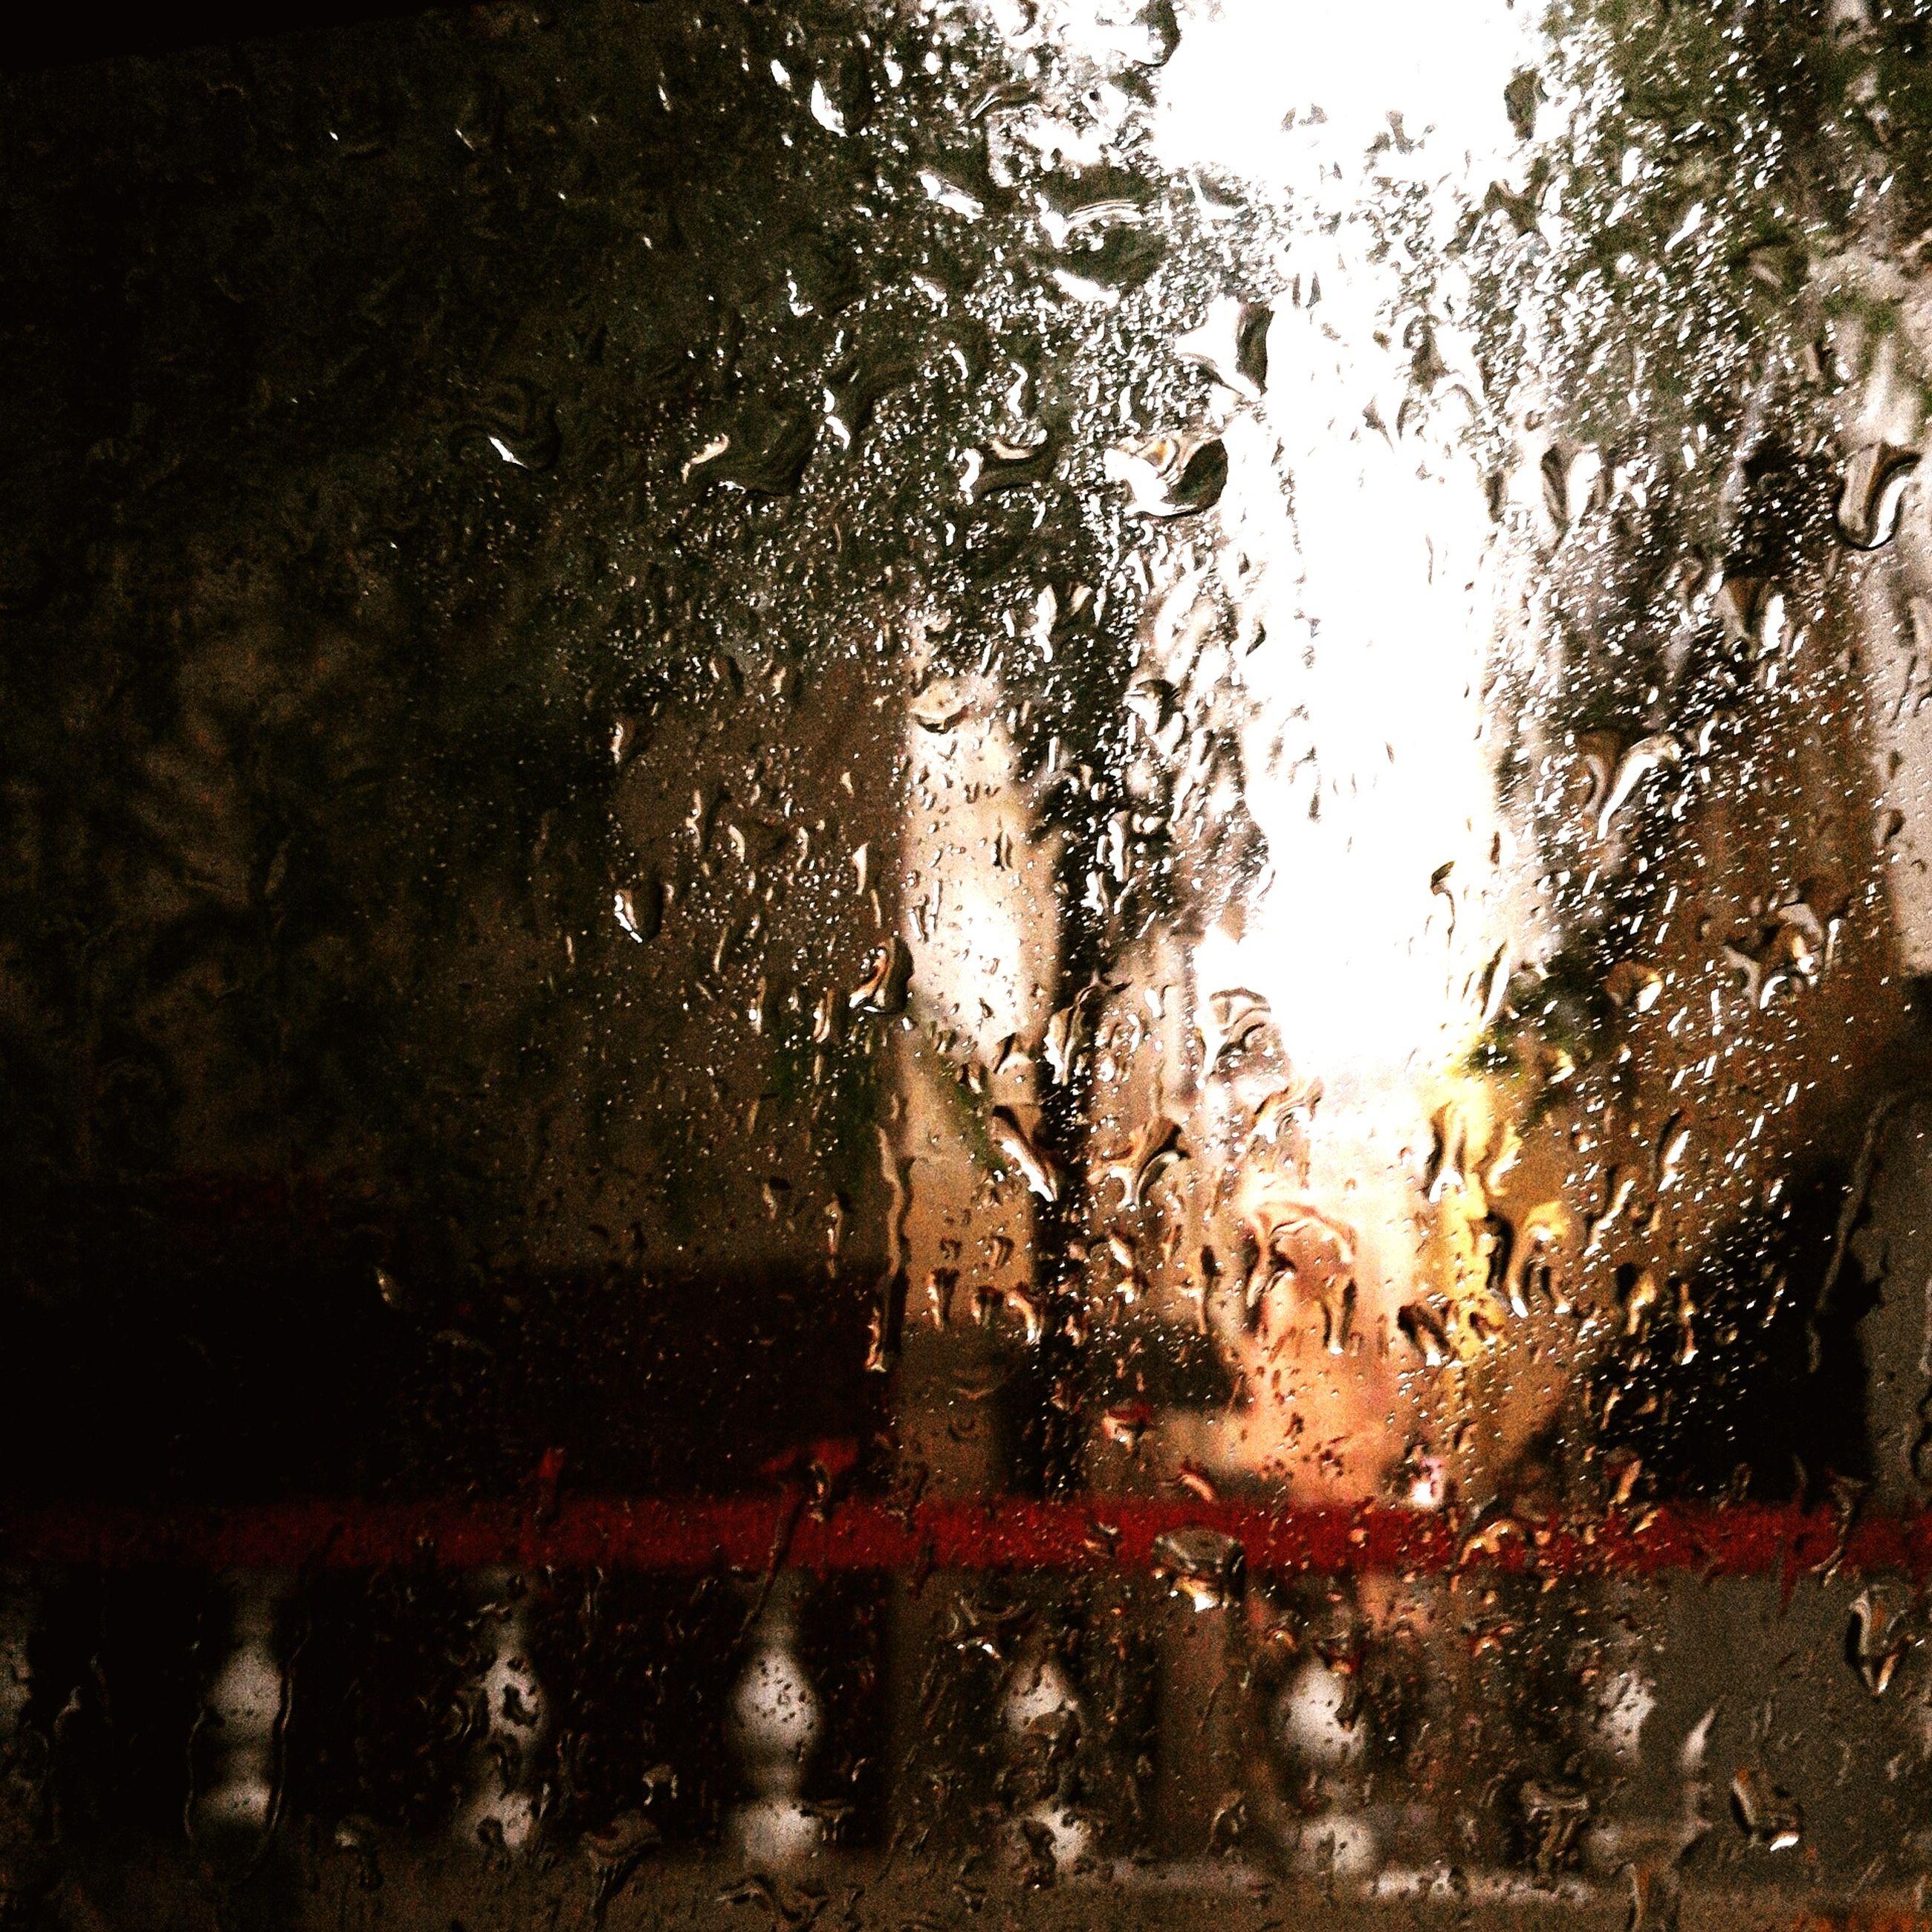 wet, drop, window, rain, glass - material, transparent, water, raindrop, season, indoors, car, monsoon, weather, glass, street, tree, transportation, land vehicle, close-up, focus on foreground